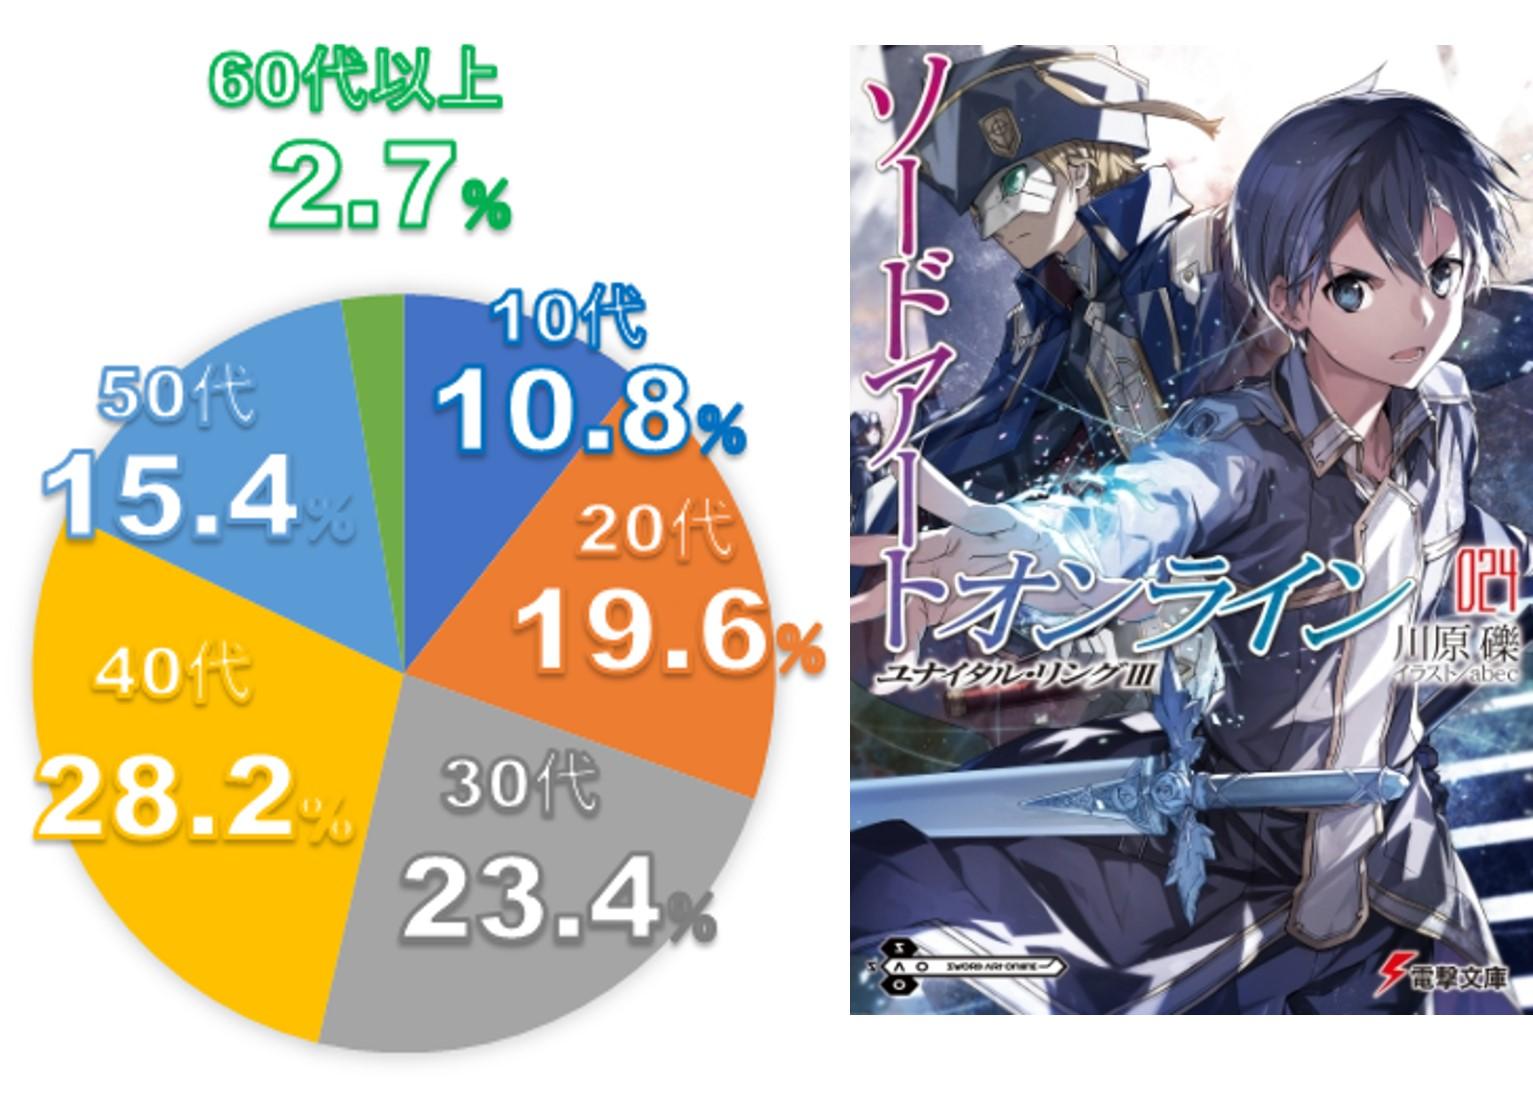 %e3%82%a2%e3%83%8b%e3%83%a1%e5%8e%9f%e4%bd%9c%e6%9c%ac%e3%83%a9%e3%83%b3%e3%82%ad%e3%83%b3%e3%82%b0-anime-ranking-%e5%8b%95%e6%bc%ab%e6%8e%92%e5%90%8d4-2